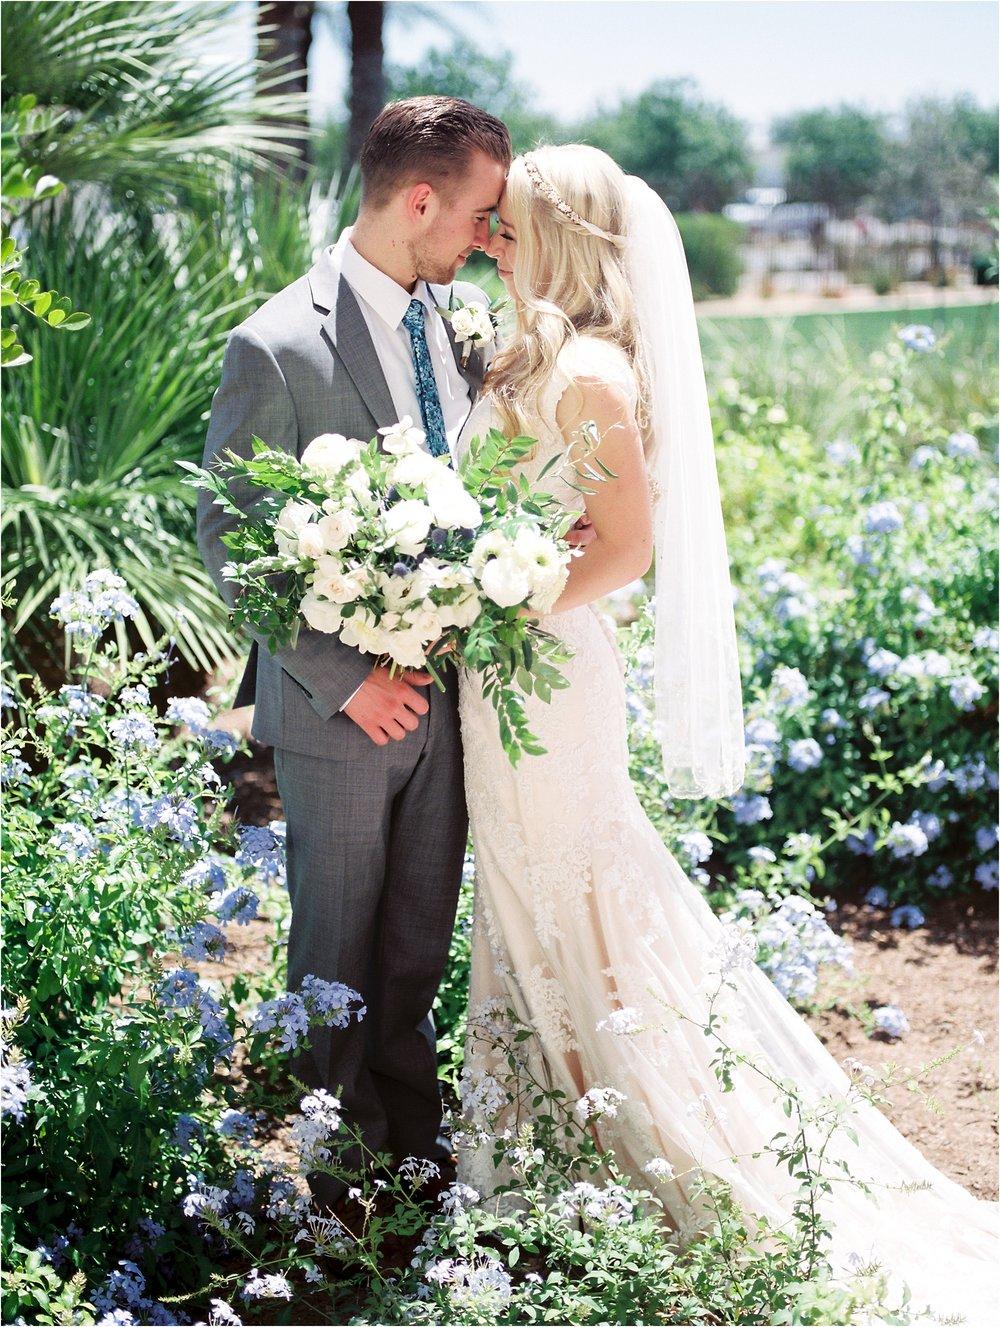 Sarah Jane Photography Film Hybrid Scottsdale Phoenix Arizona Destination Wedding Photographer Julie ans Mason_0020.jpg